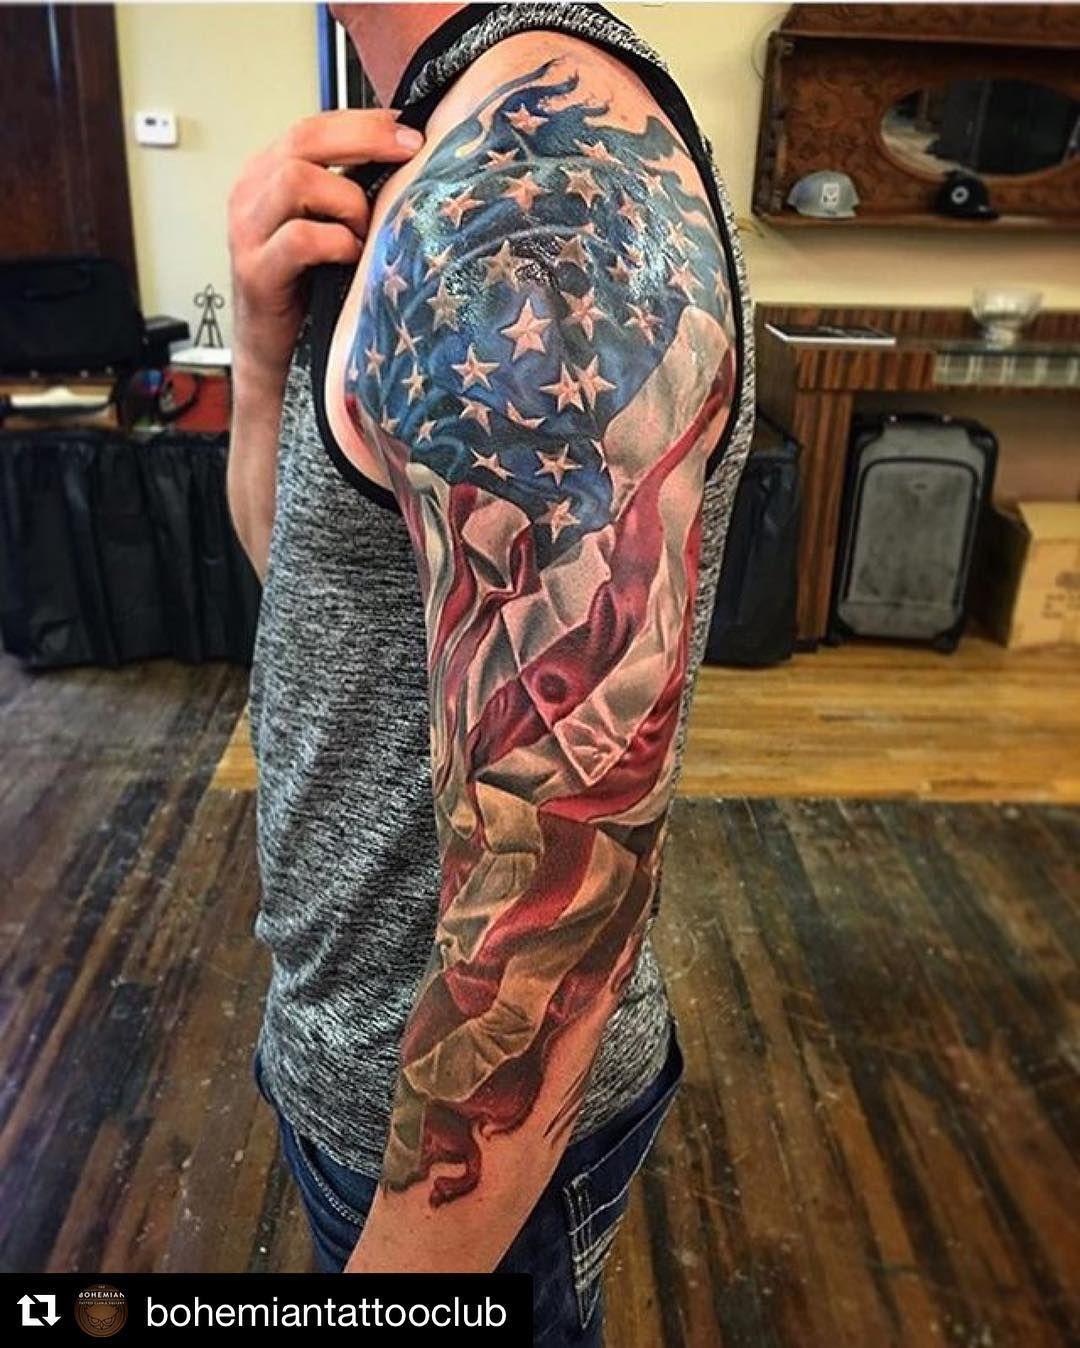 Tattoo Ideas Us: #Repost @bohemiantattooclub With @repostapp ・・・ American